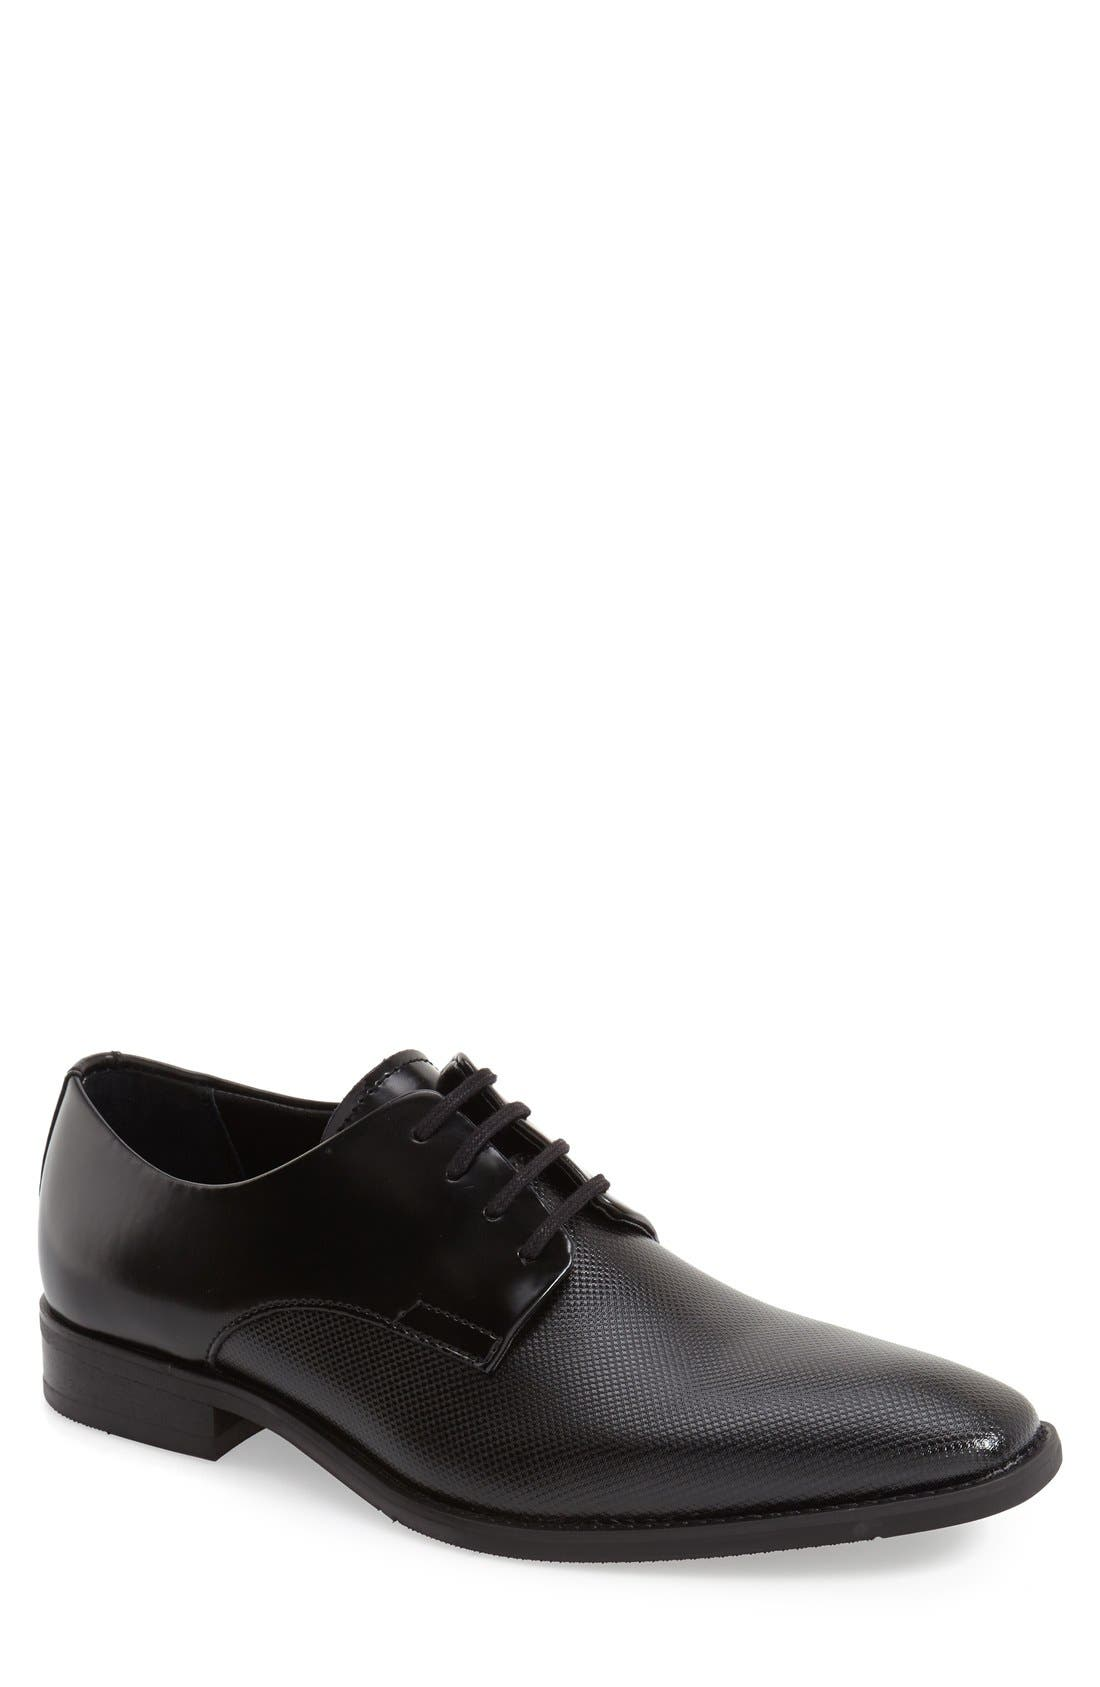 Formal Dress Shoes